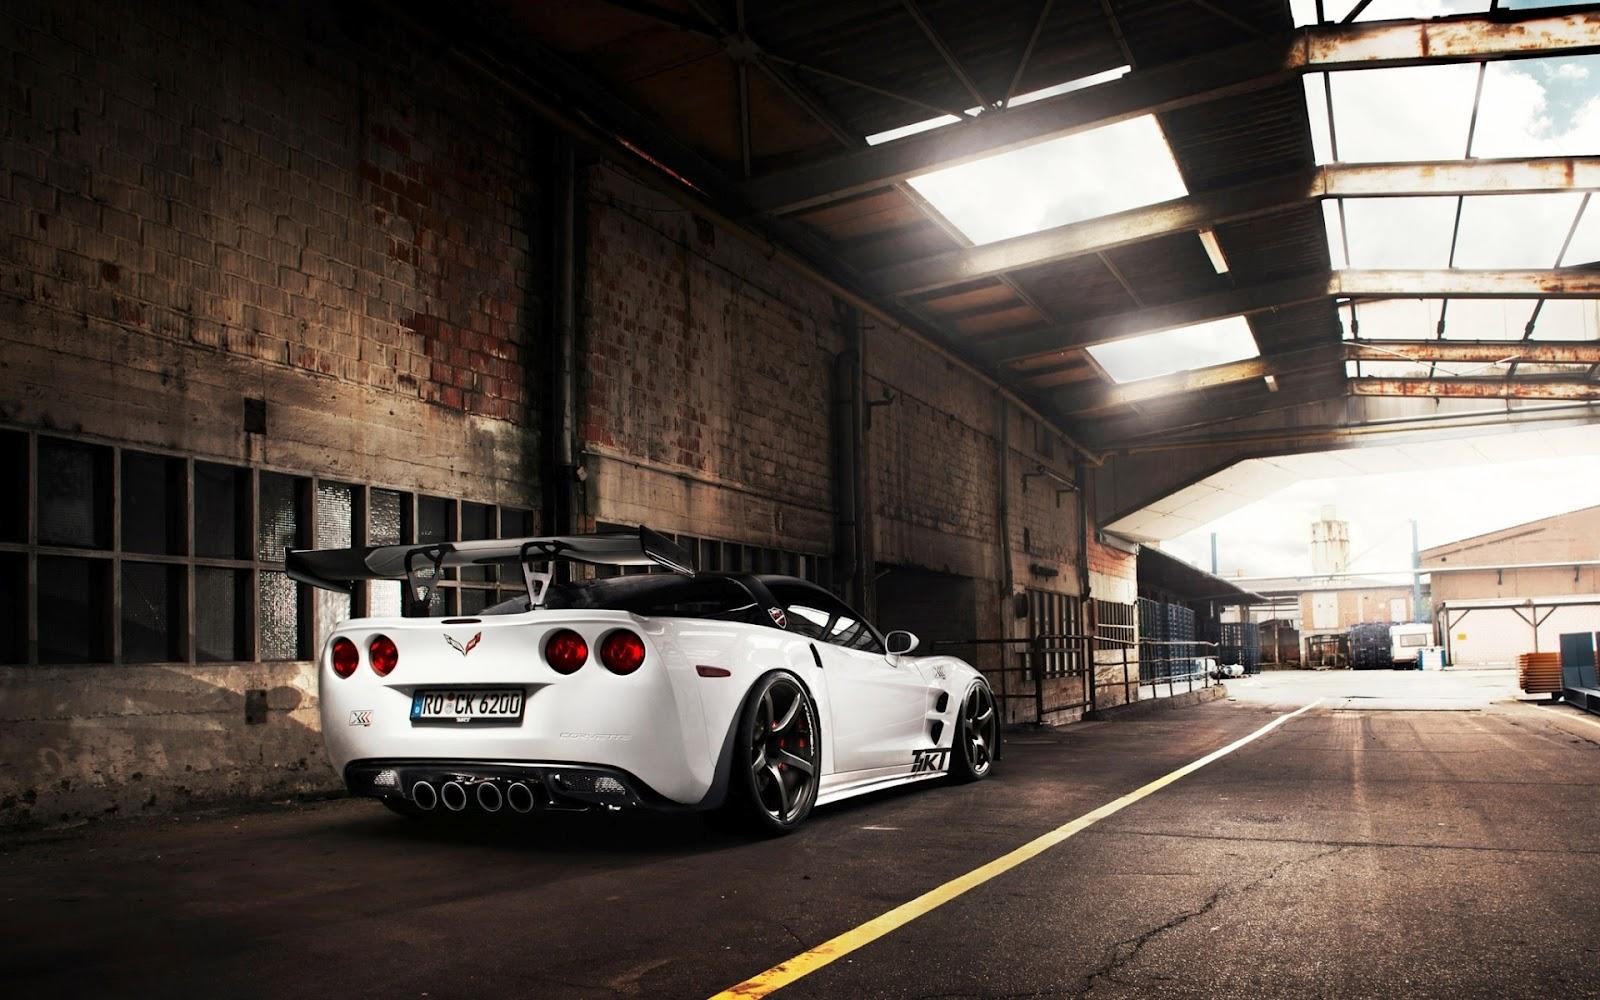 http://1.bp.blogspot.com/-P8cyCjc1DiM/T6nNs0eTjEI/AAAAAAAAcZY/WP0lkSpeDHY/s1600/Chevrolet-Corvette-ZR1-White_Wallpapers.jpg